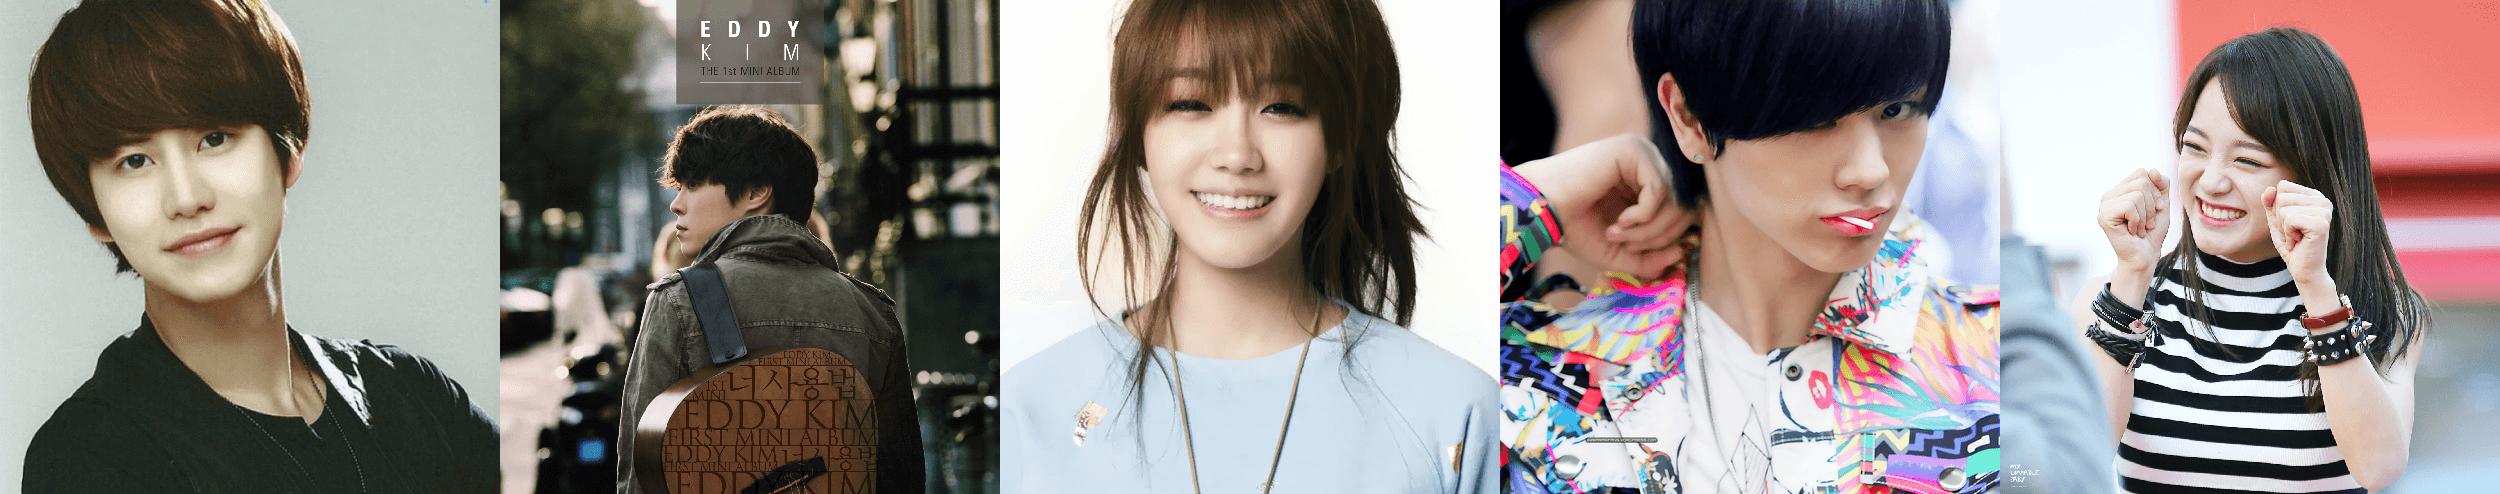 super-junior-kyuhyun-eddy-kim-a-pink-eunji-btob-sungjae-gugudan-sejeong